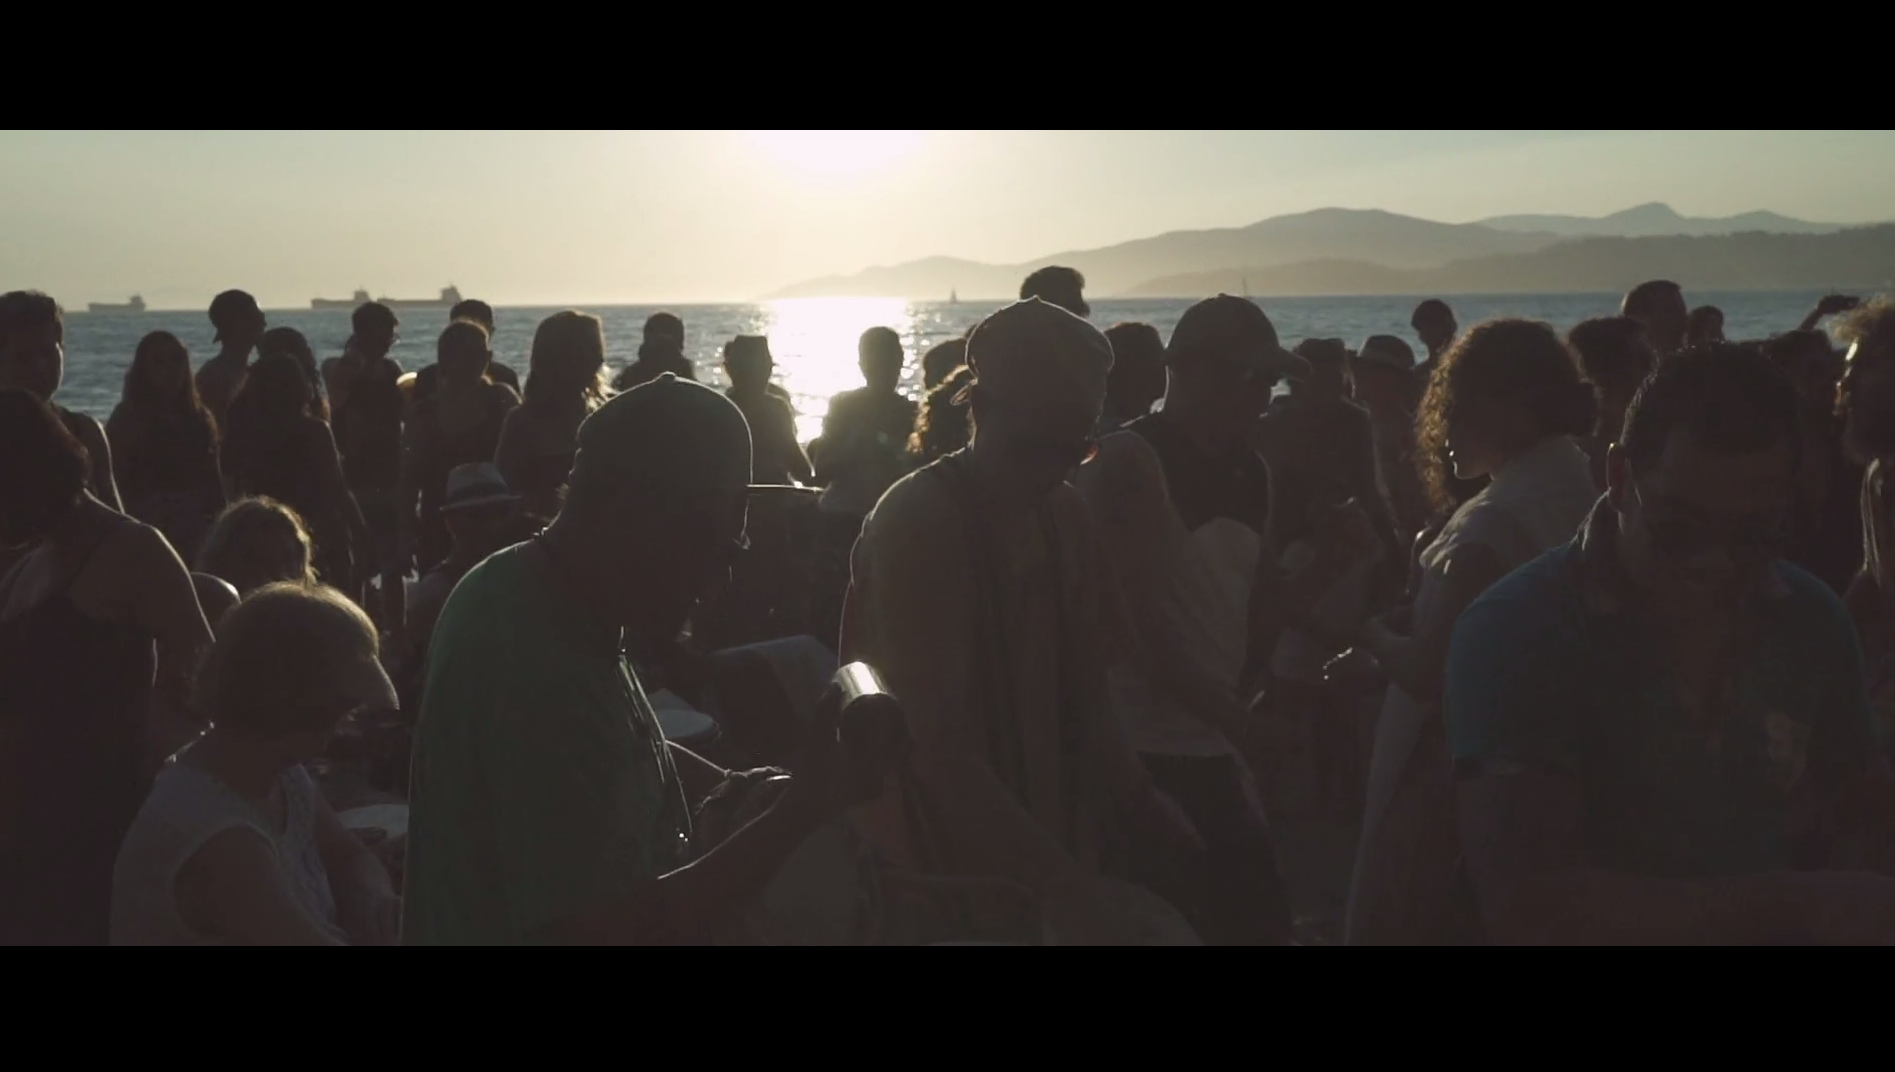 Screenshot / Vimeo